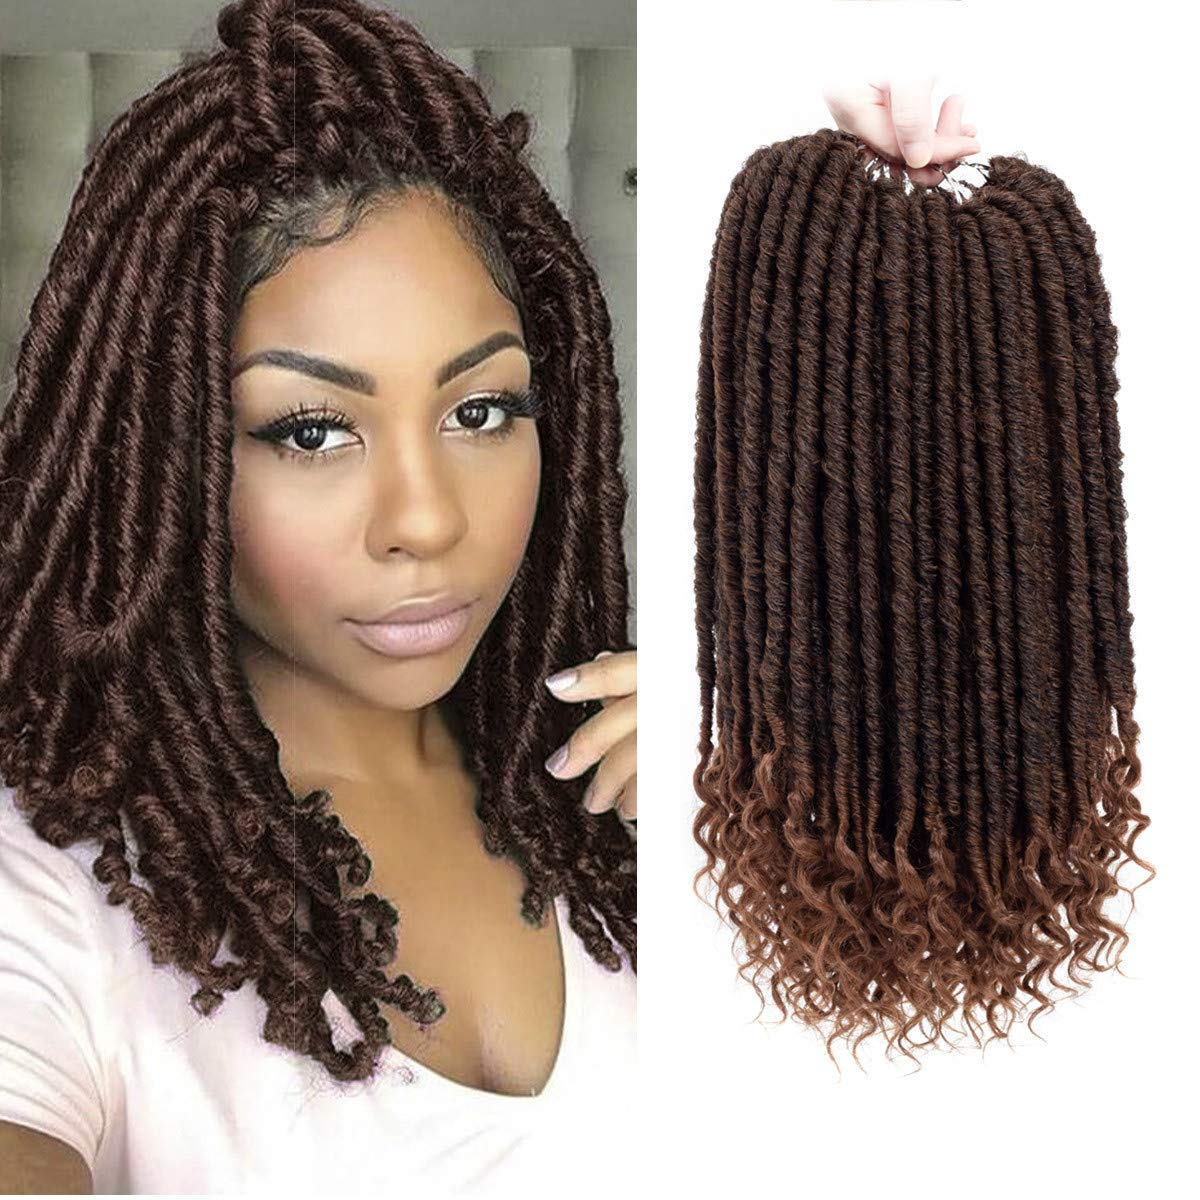 Amazon Com Zhen Show Crochet Goddess Locs Braids Straight Hair Curly Ends Synthetic Faux Locs Crochet Braiding Hair Extensions African Hairstyles Bohemian Havana Mambo Twist Locs 18 3packs T1b 30 Beauty